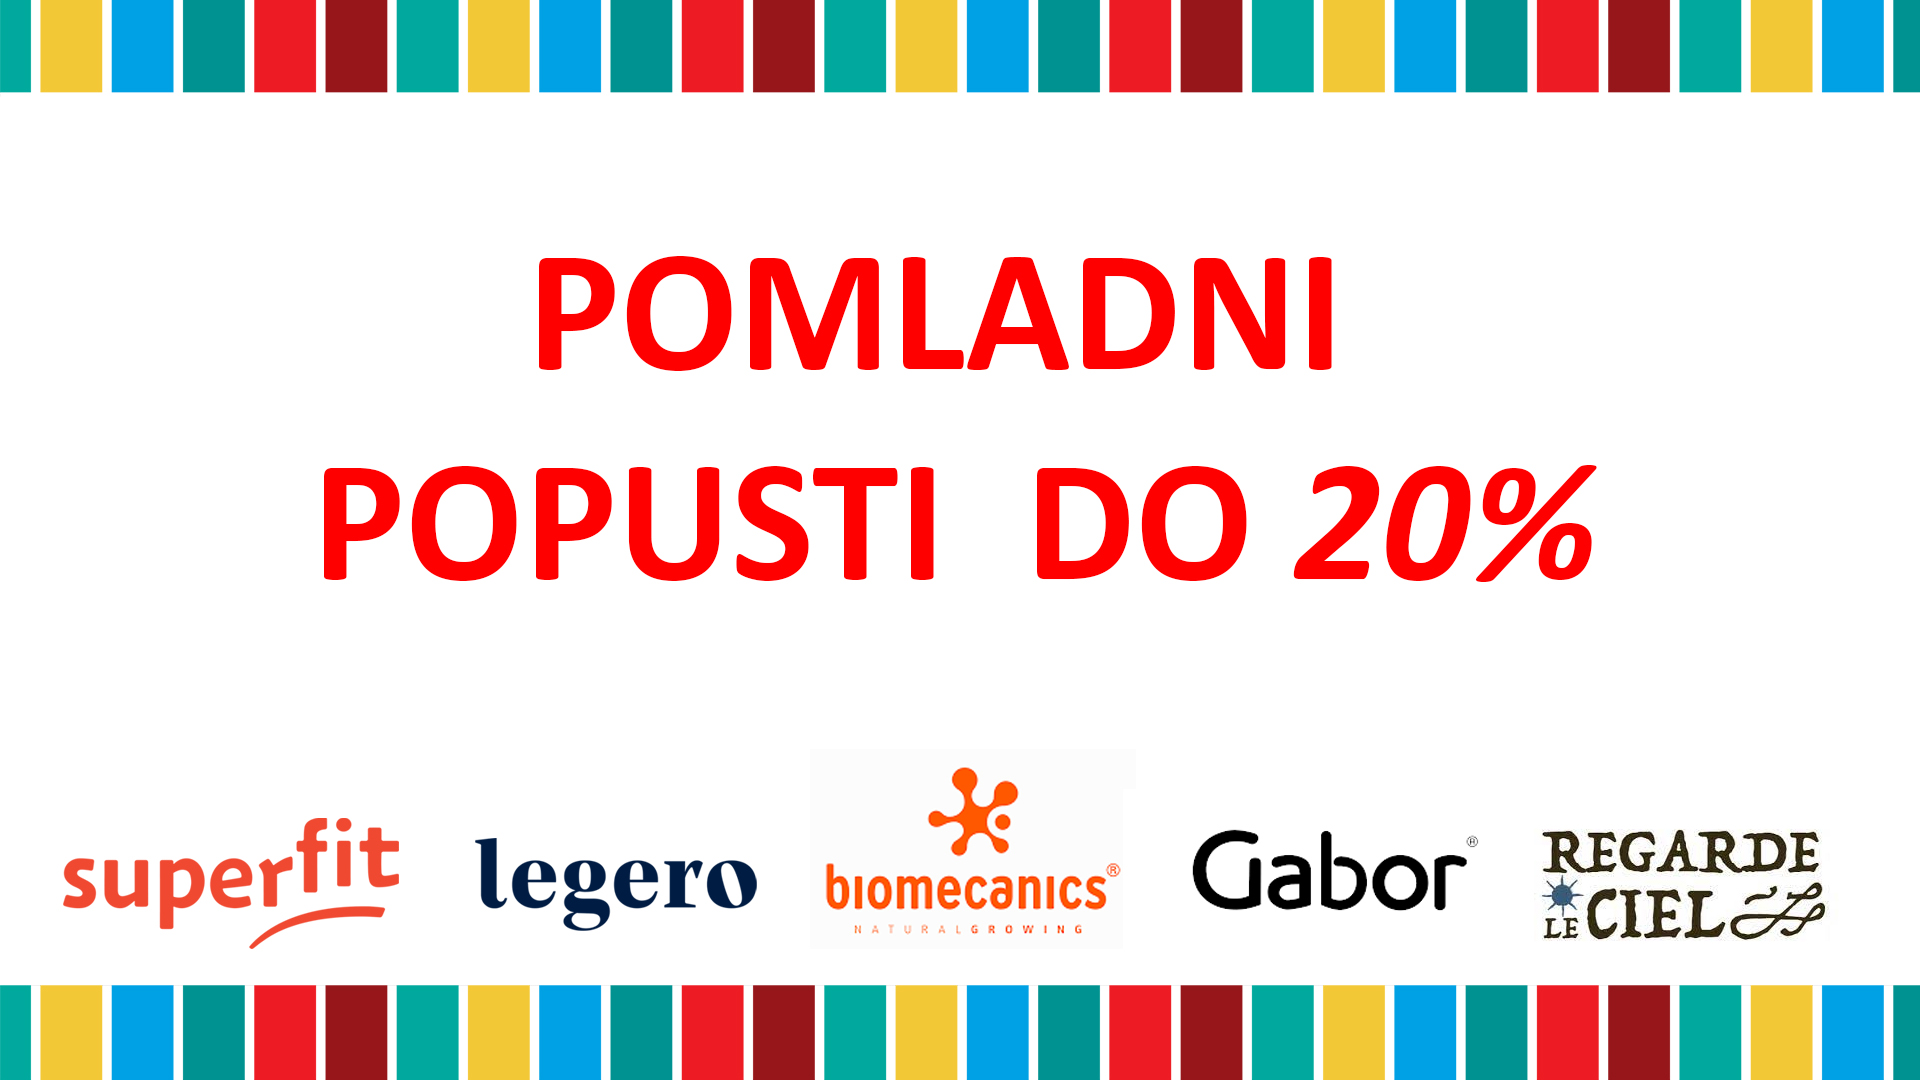 Pomladni popust 2021 - do 20%